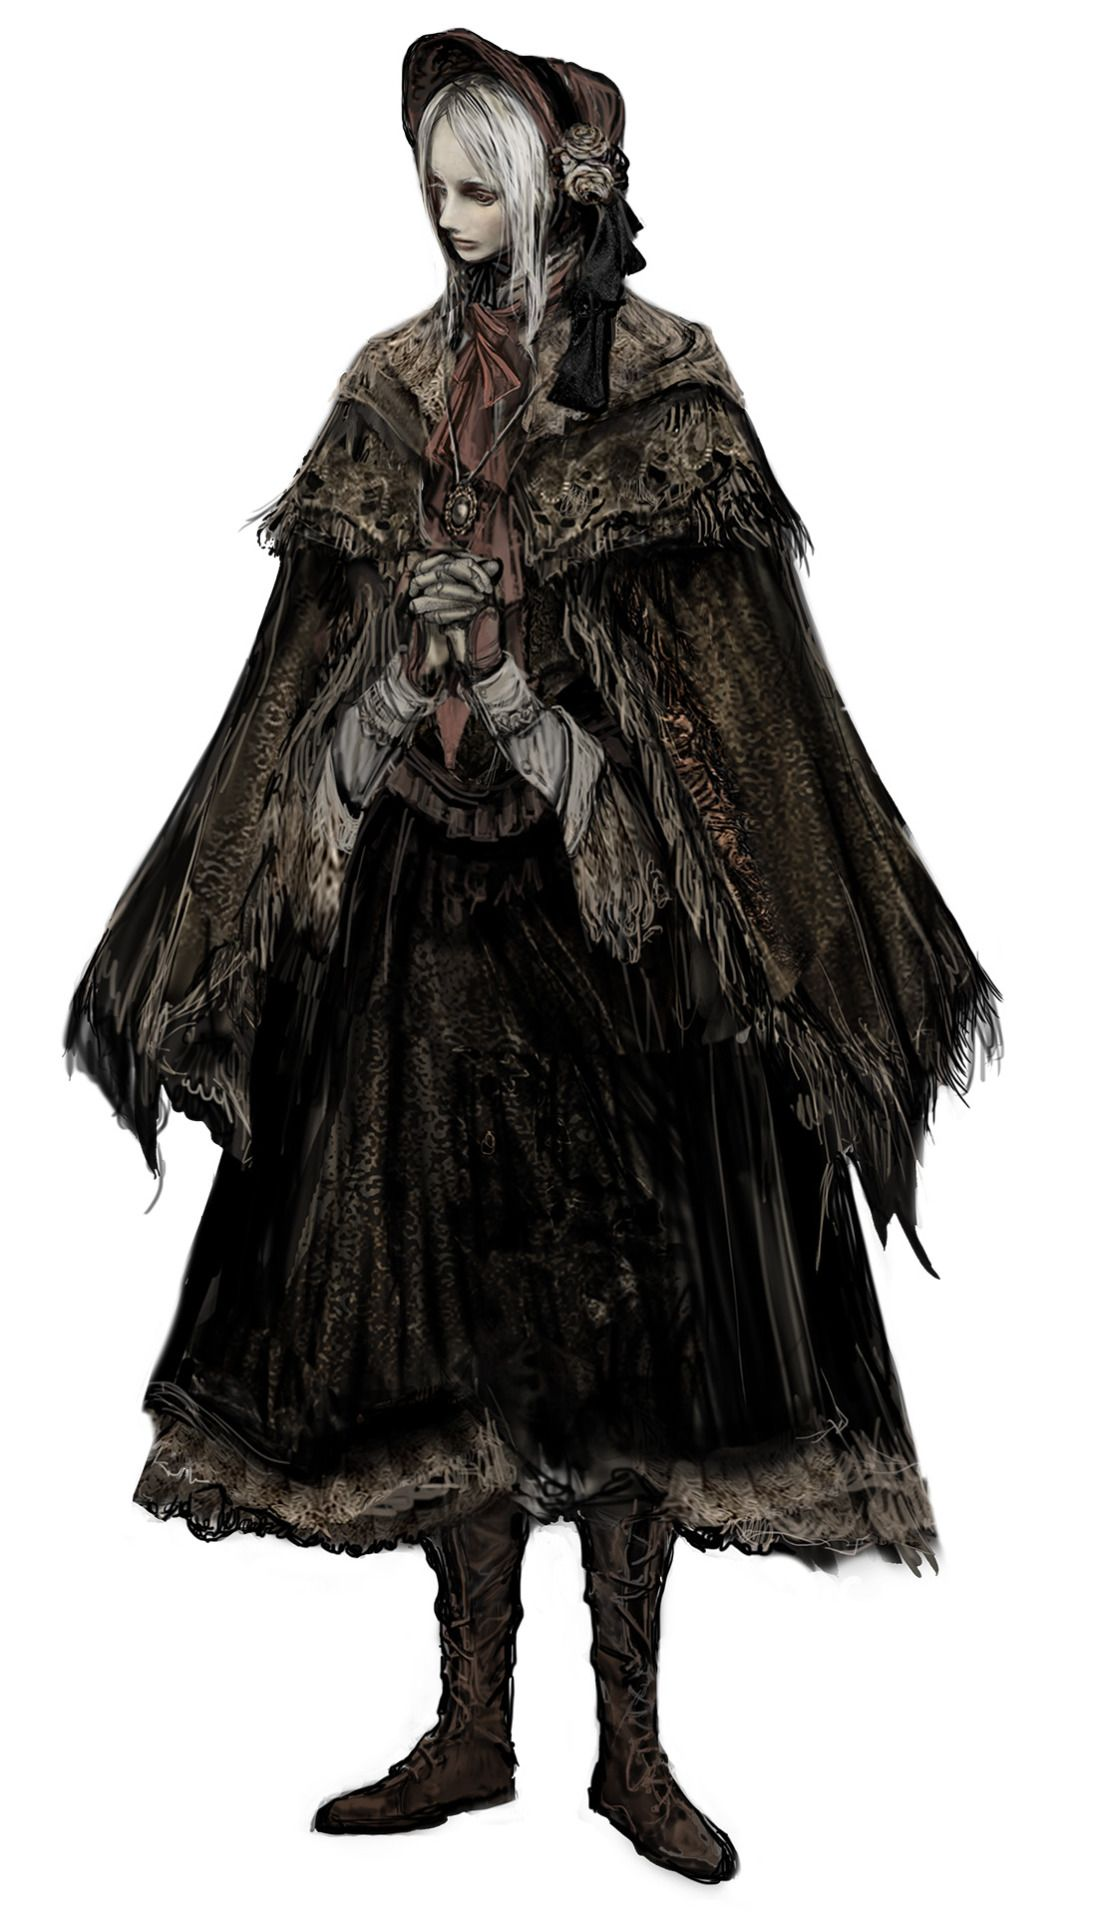 http://lordranandbeyond.tumblr.com/post/122103640007/mori-girl-life-i-love-her-costume